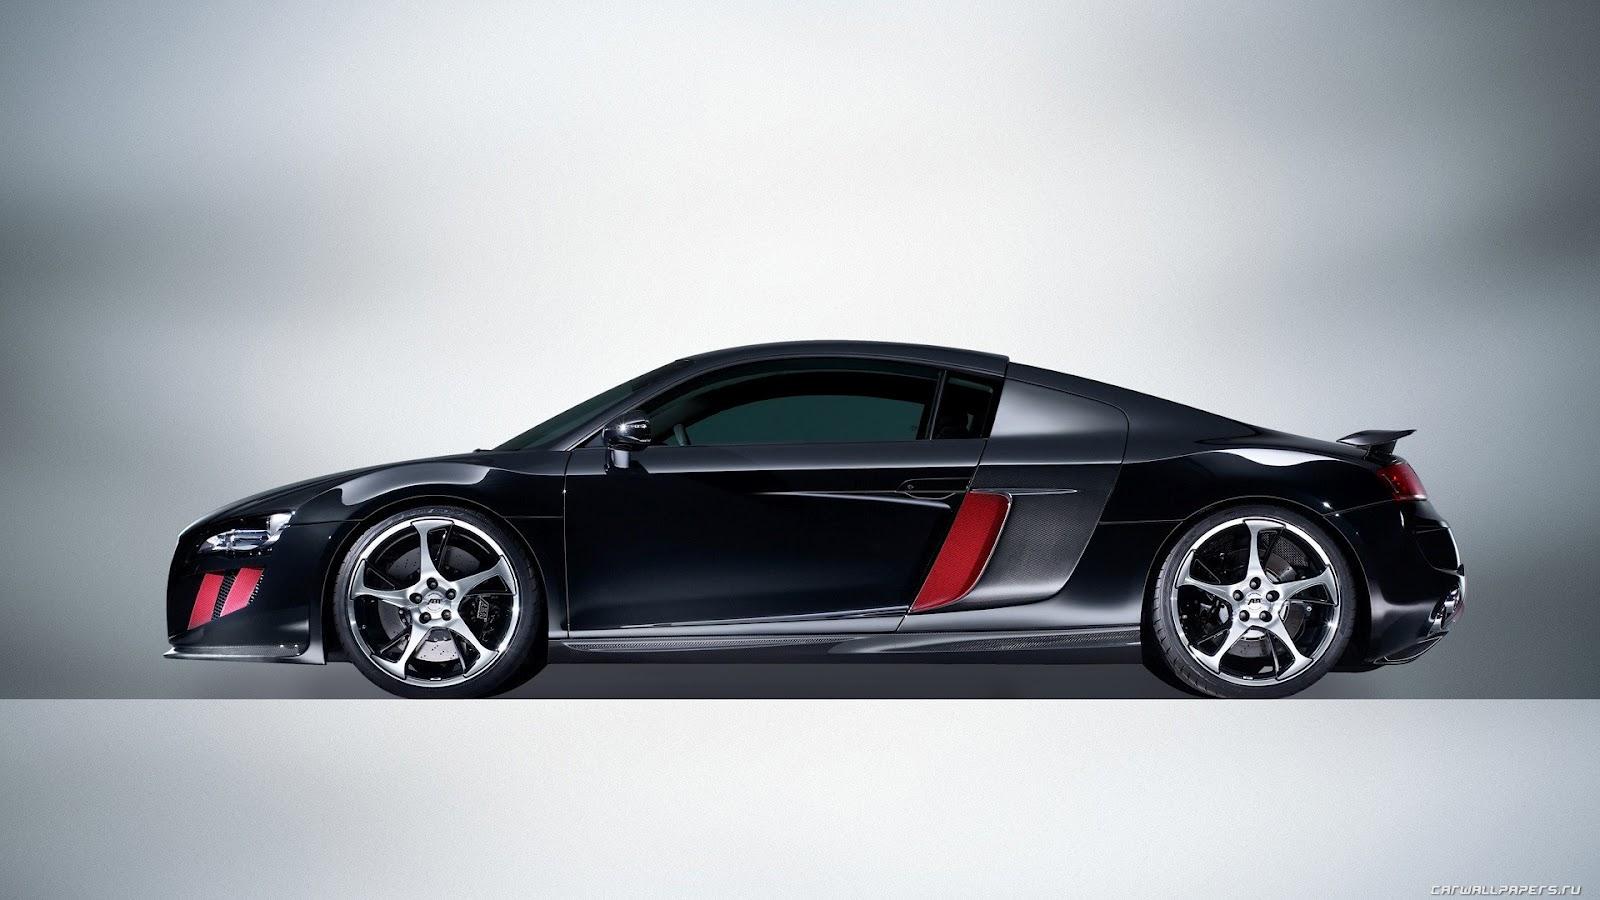 Free Cars HD: Audi R8 HD Wallpapers